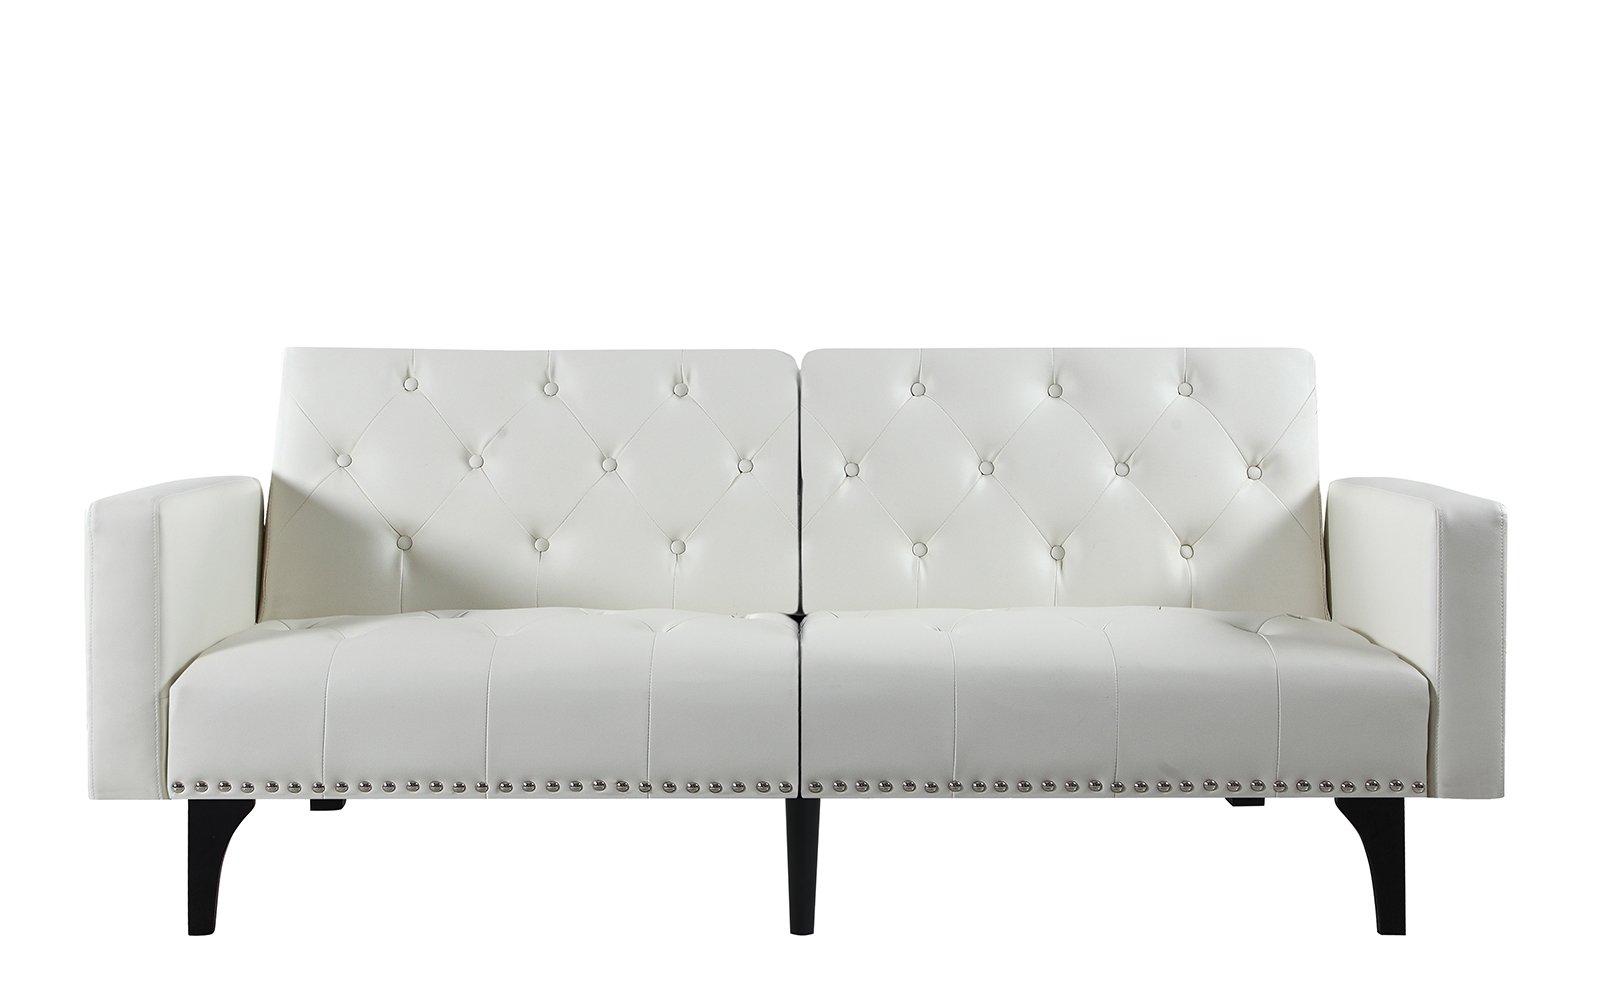 leather sleeper sofa with nailheads living room set malaysia modern splitback tufted futon nailhead trim